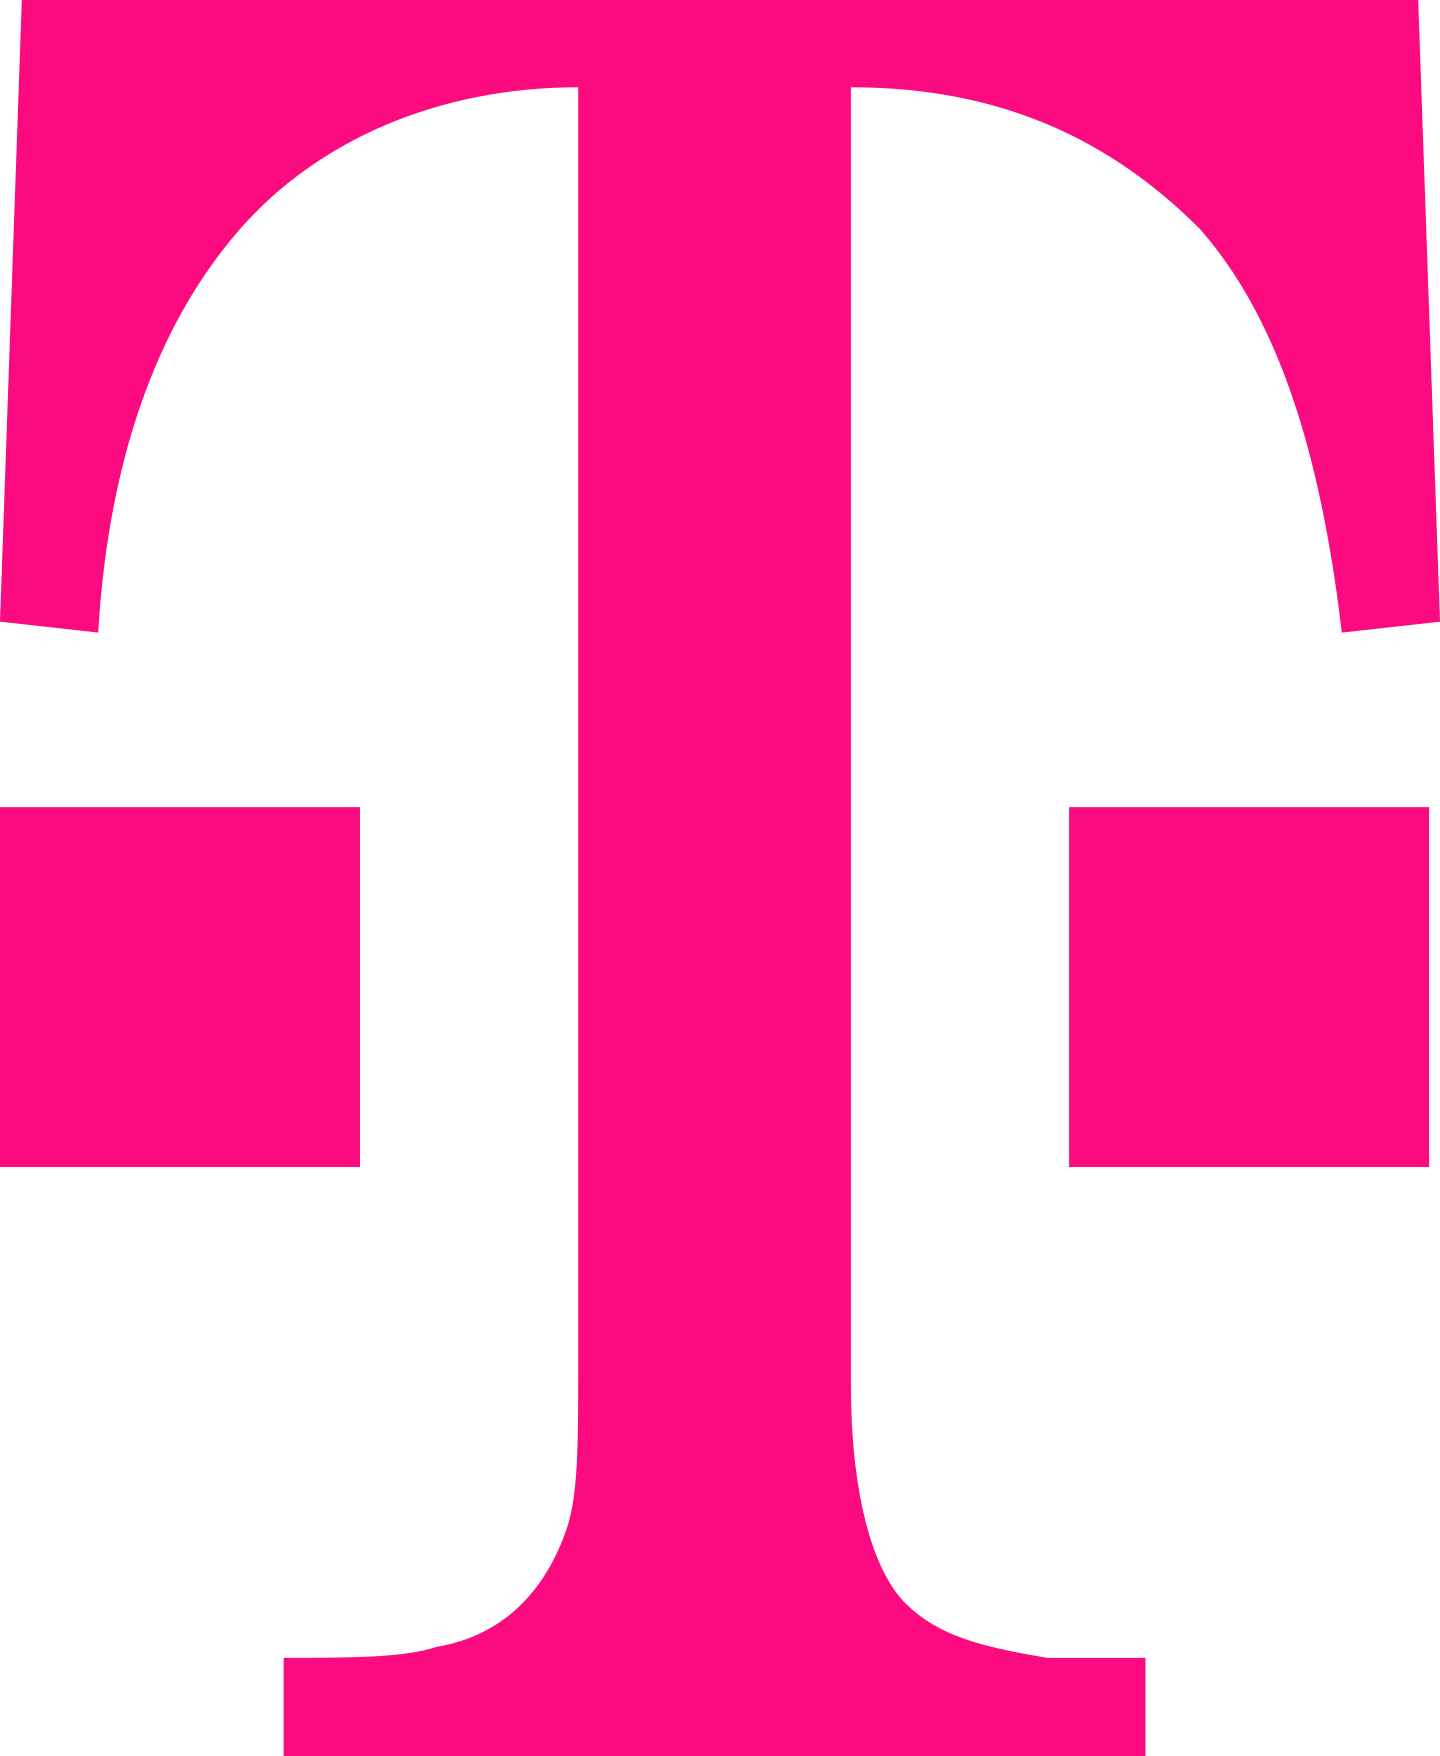 deutsche telekom logo 4 - Deutsche Telekom Logo